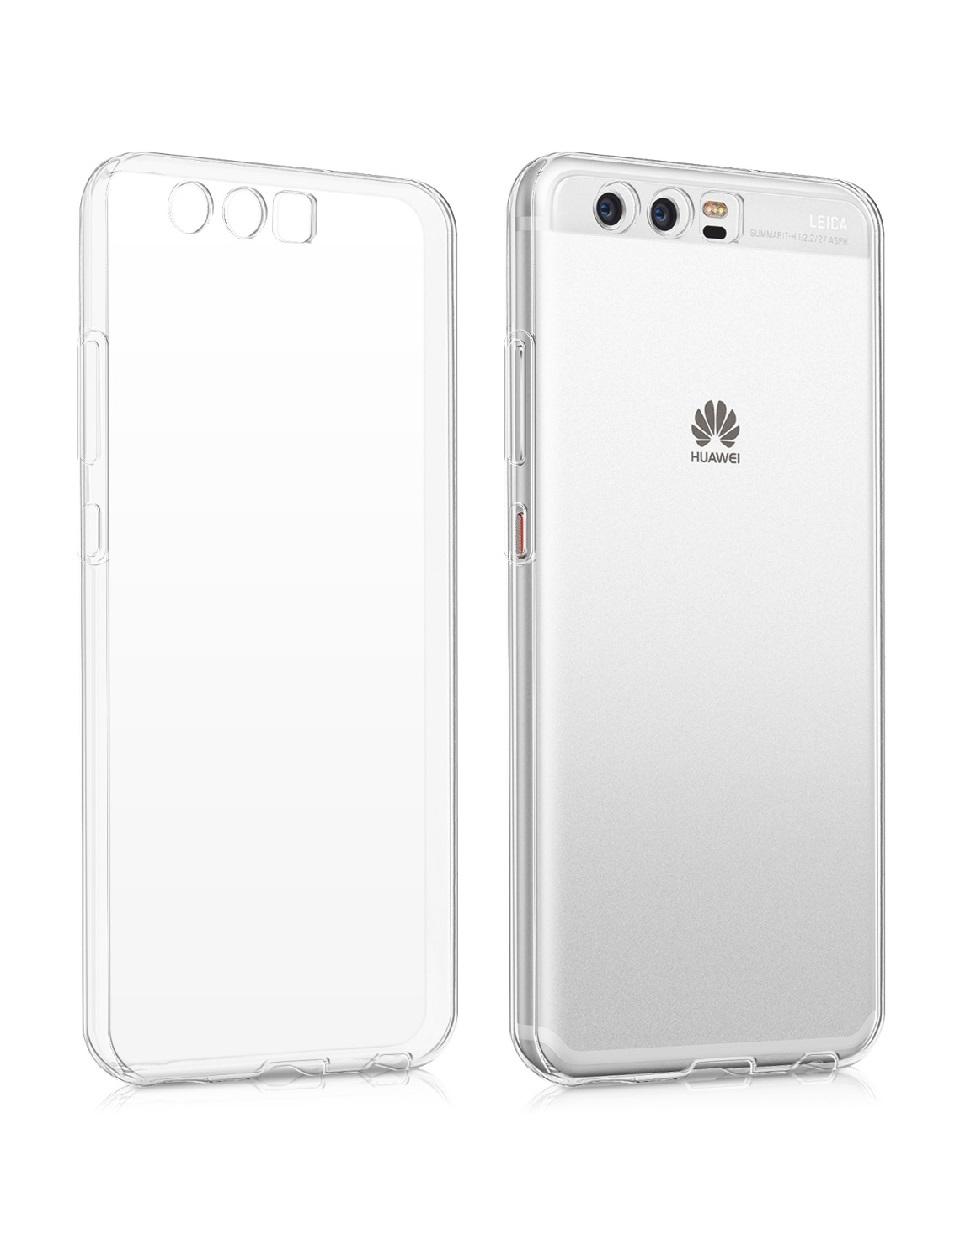 Huawei P10 cover